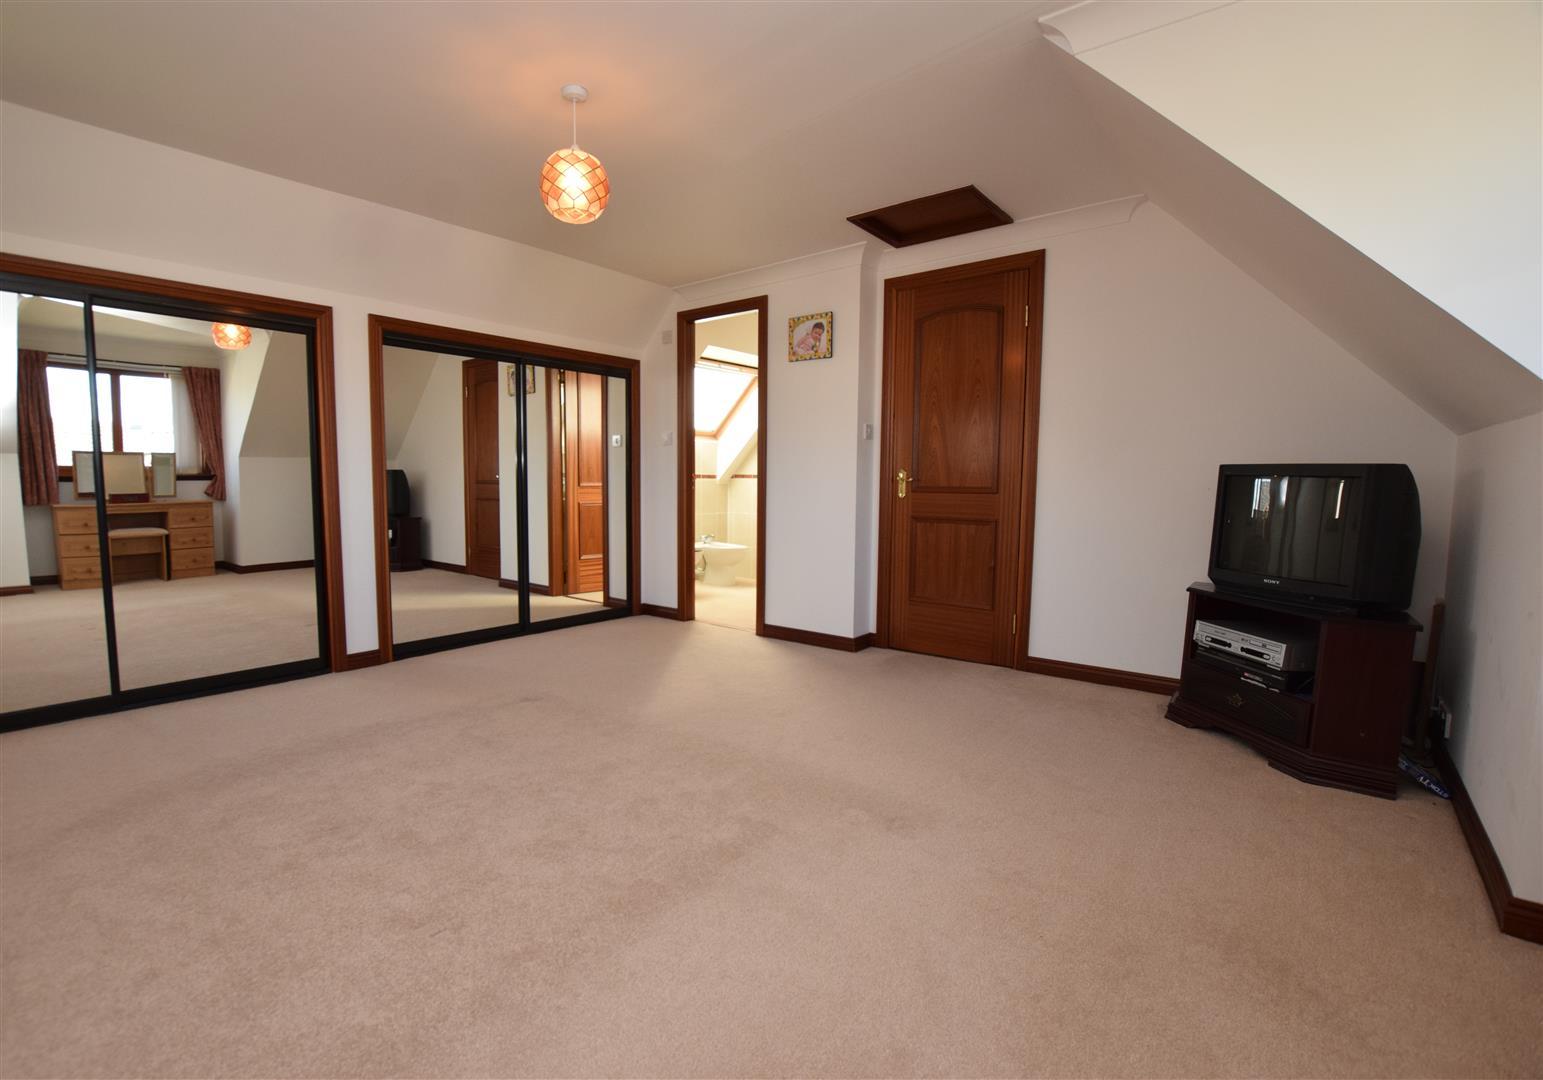 89, David Douglas Avenue, Scone, Perthshire, PH2 6QQ, UK